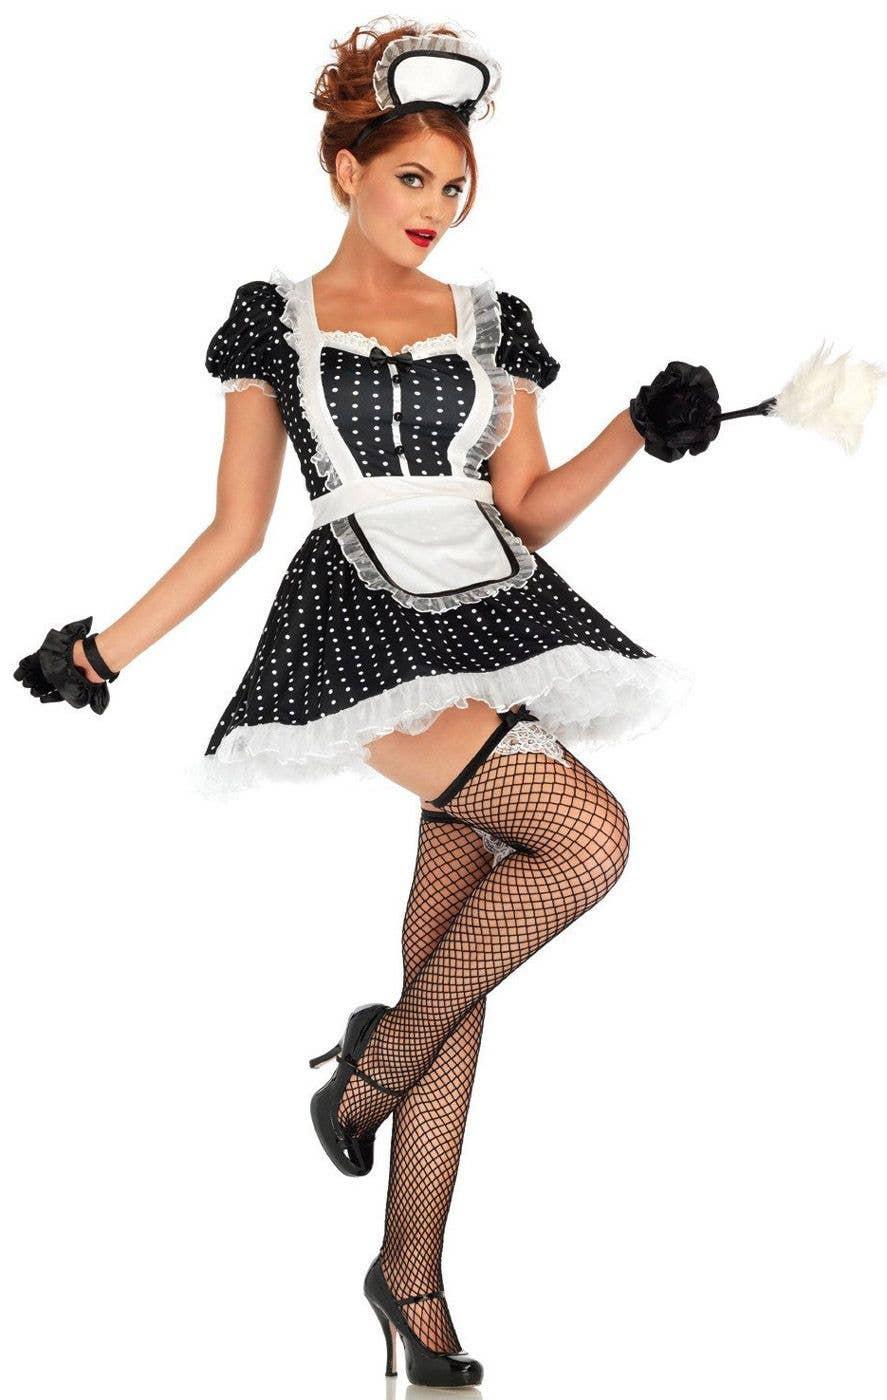 857ffa69ab8 Frisky French Maid Sexy Costume | Women's Maid Fancy Dress Costume